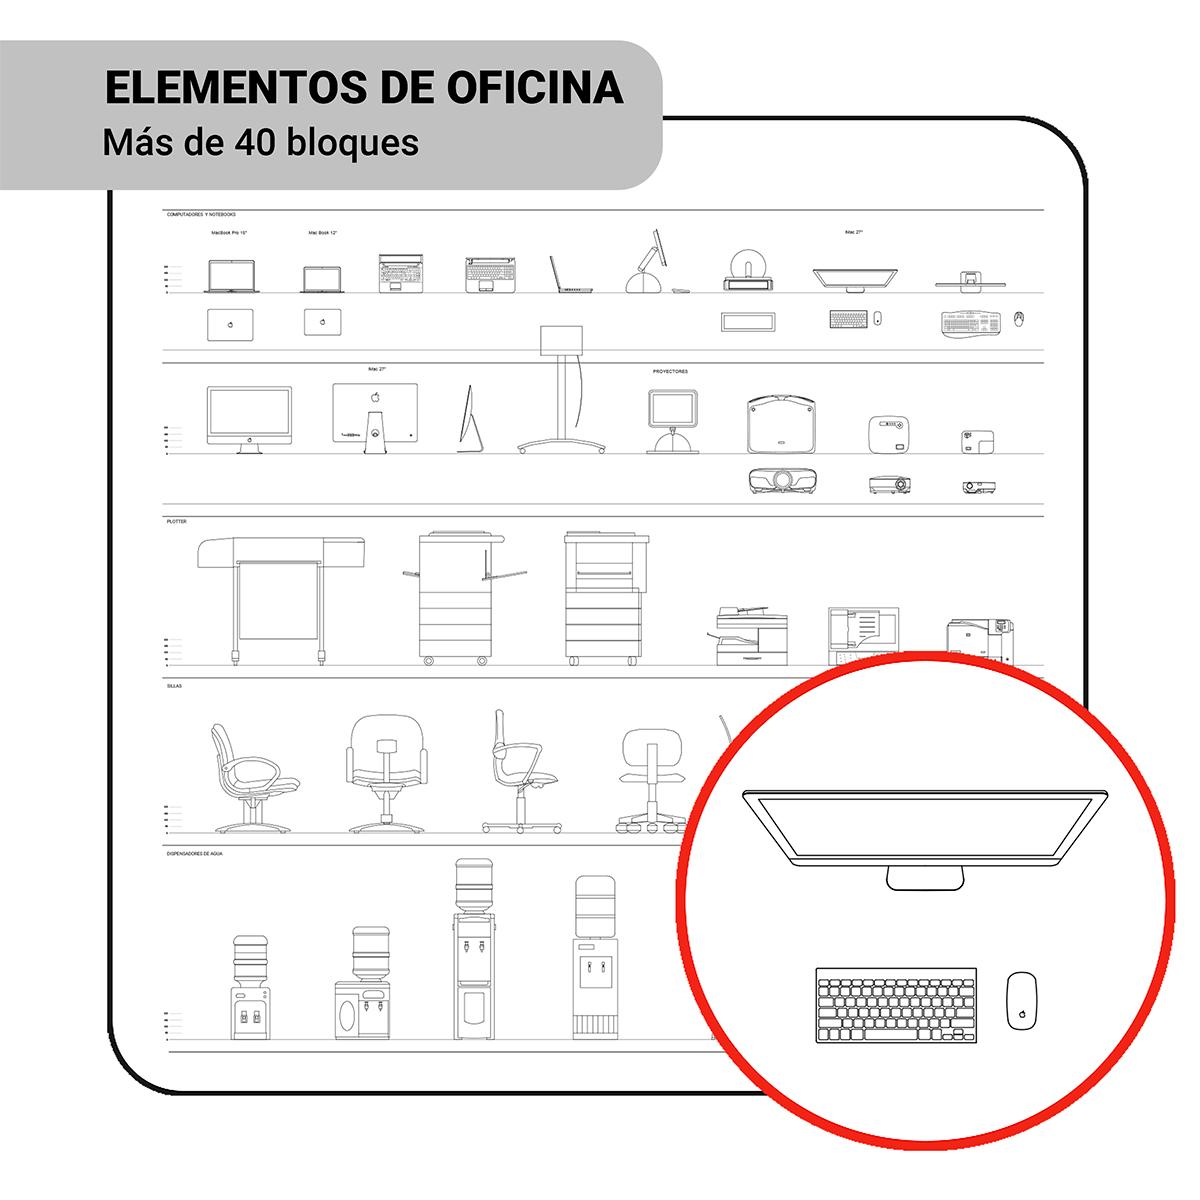 Bloques: Elementos de Oficina